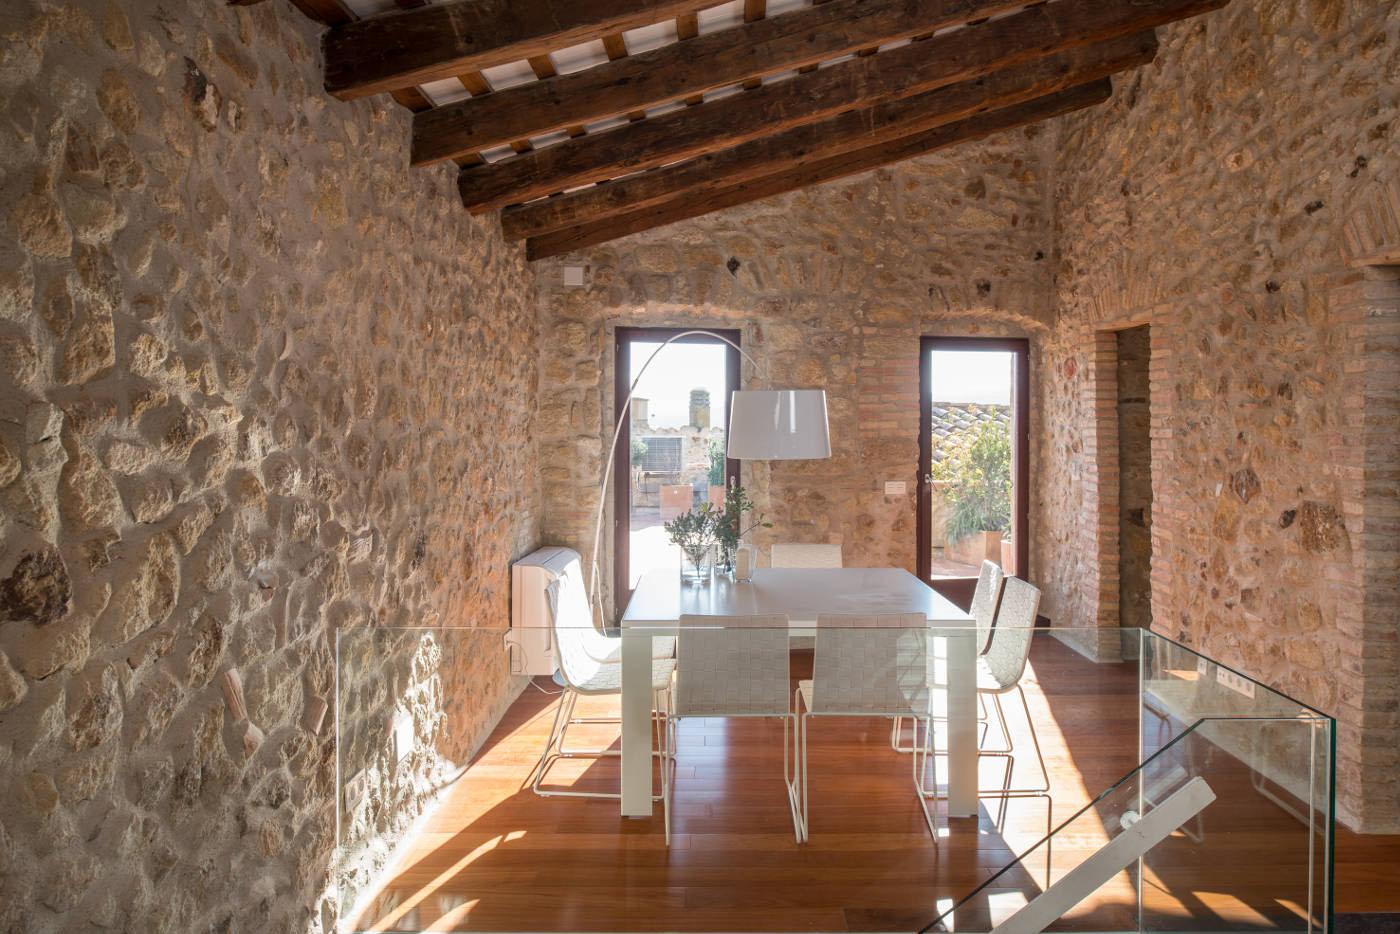 Costa Brava Mediterranean Stone House 9 Idesignarch